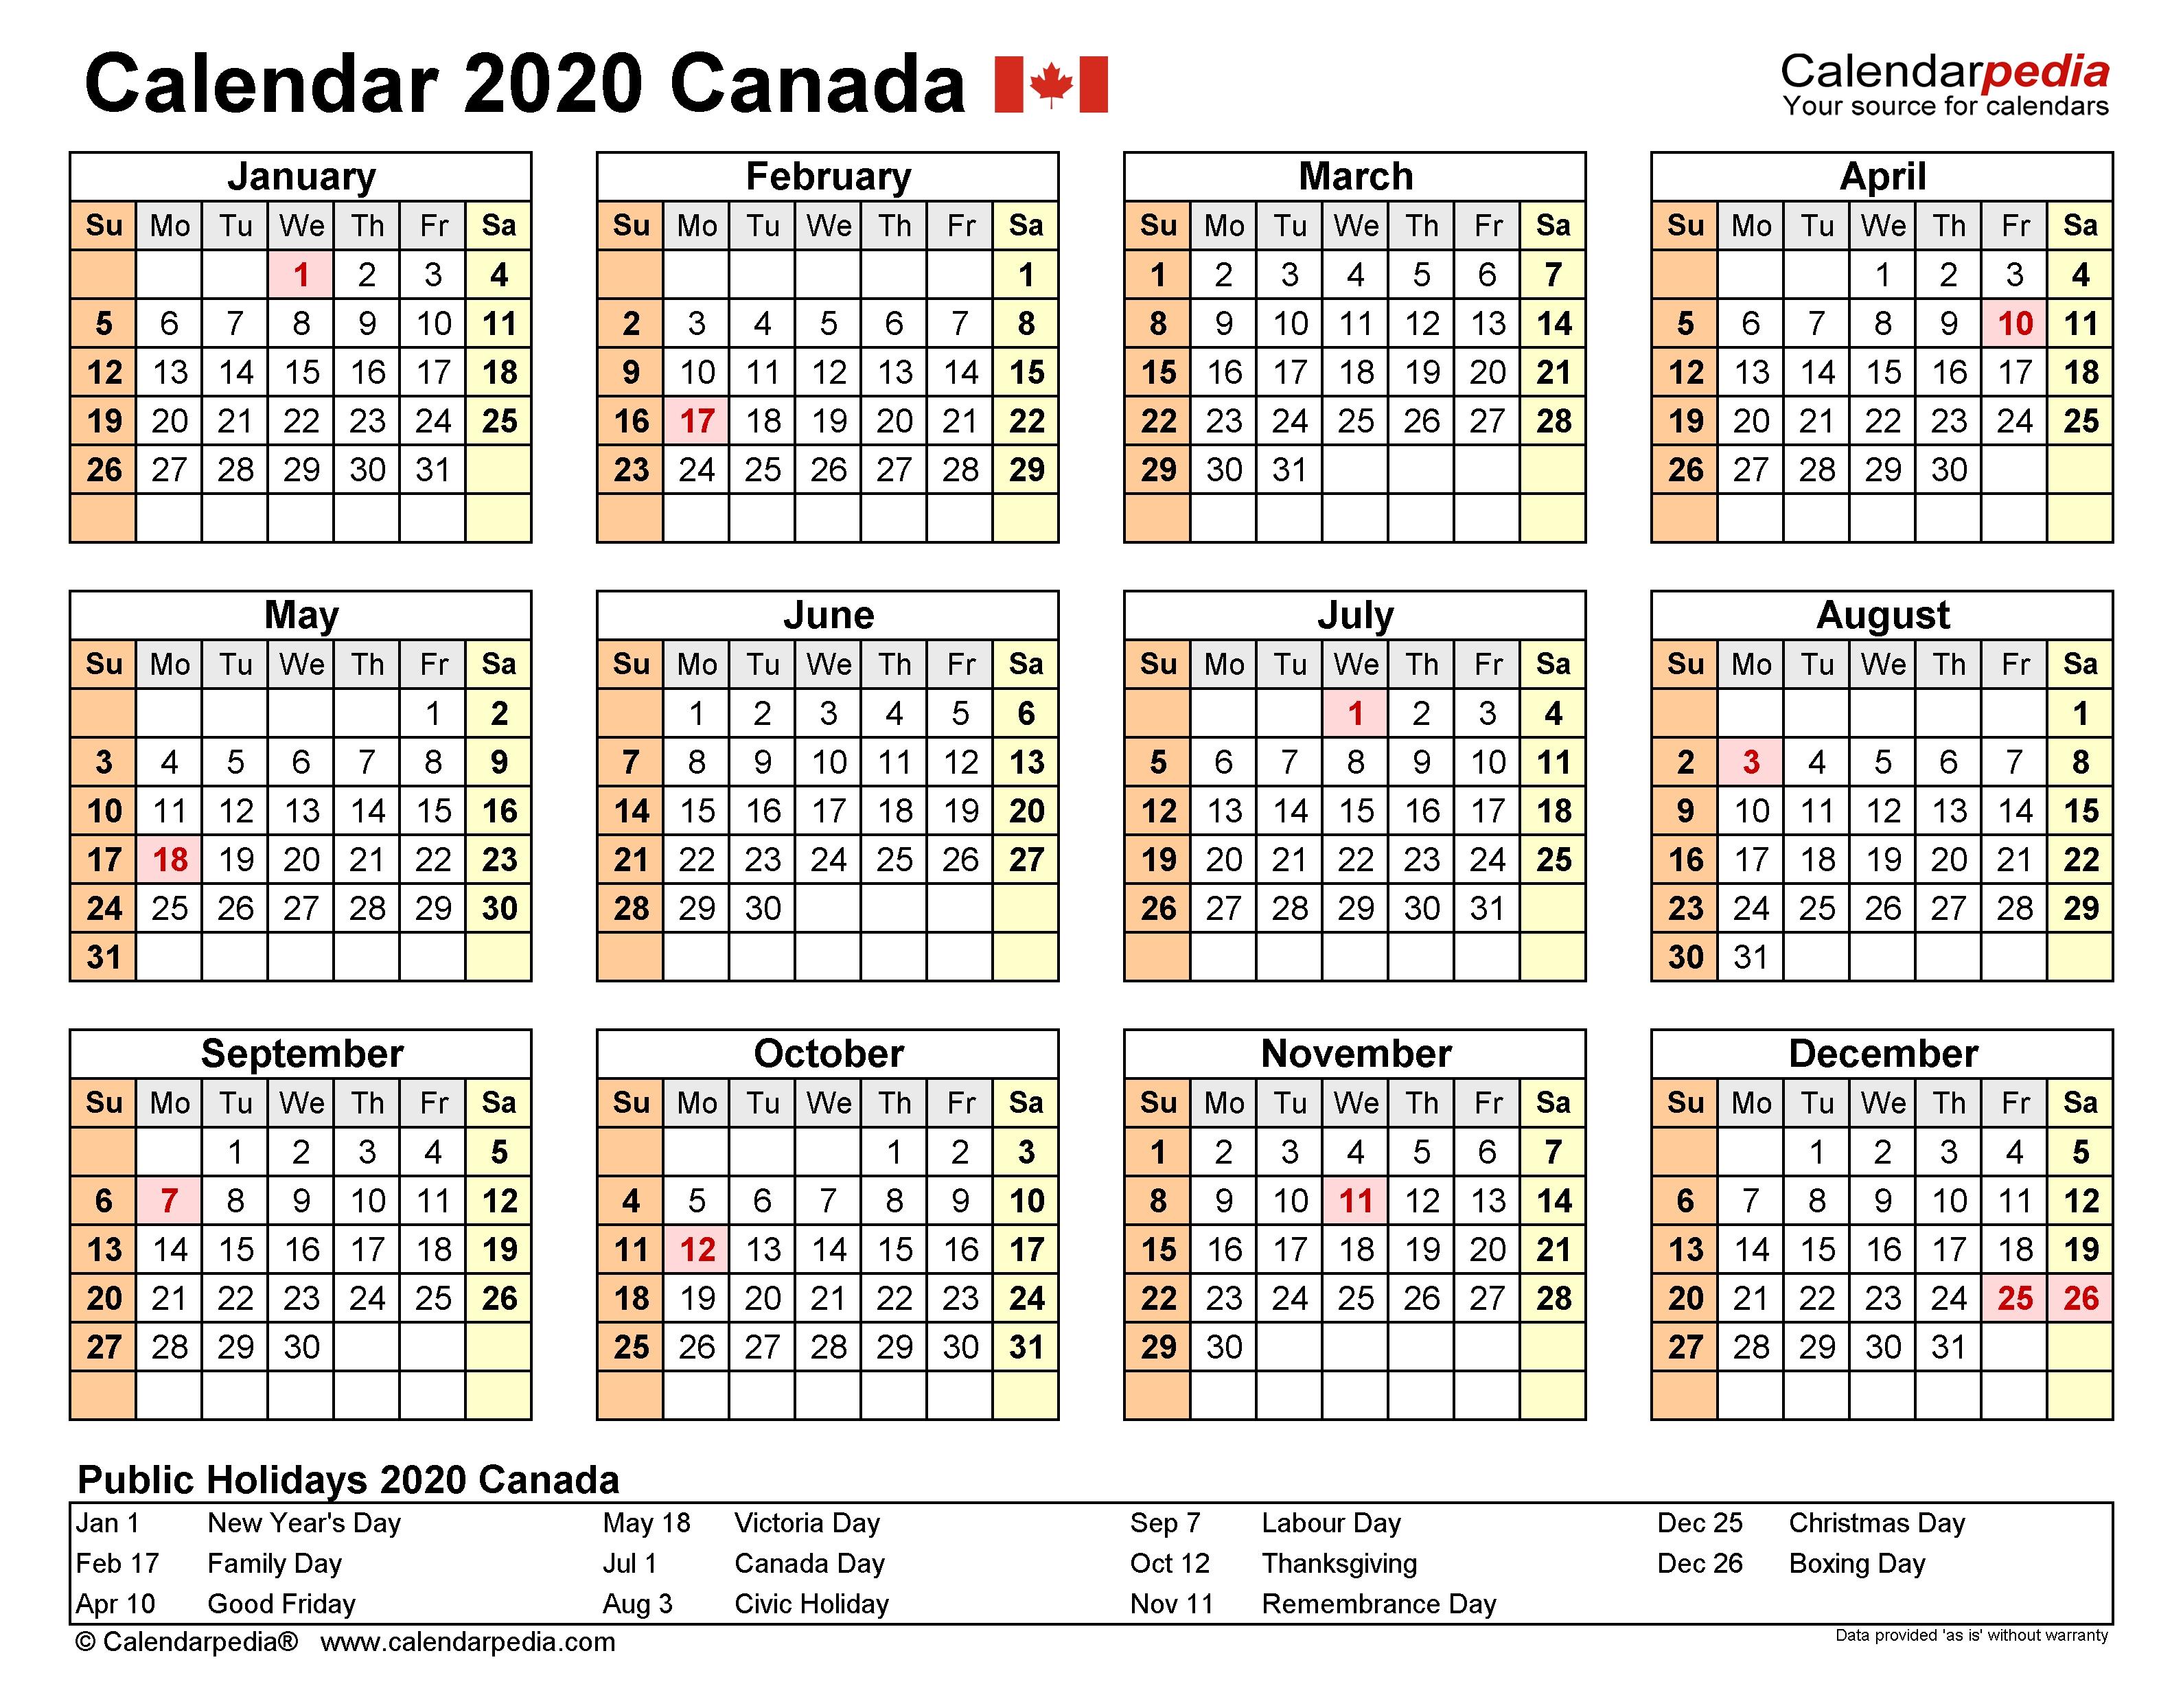 Canada Calendar 2020 - Free Printable Excel Templates-Staff Calendar Template 2020